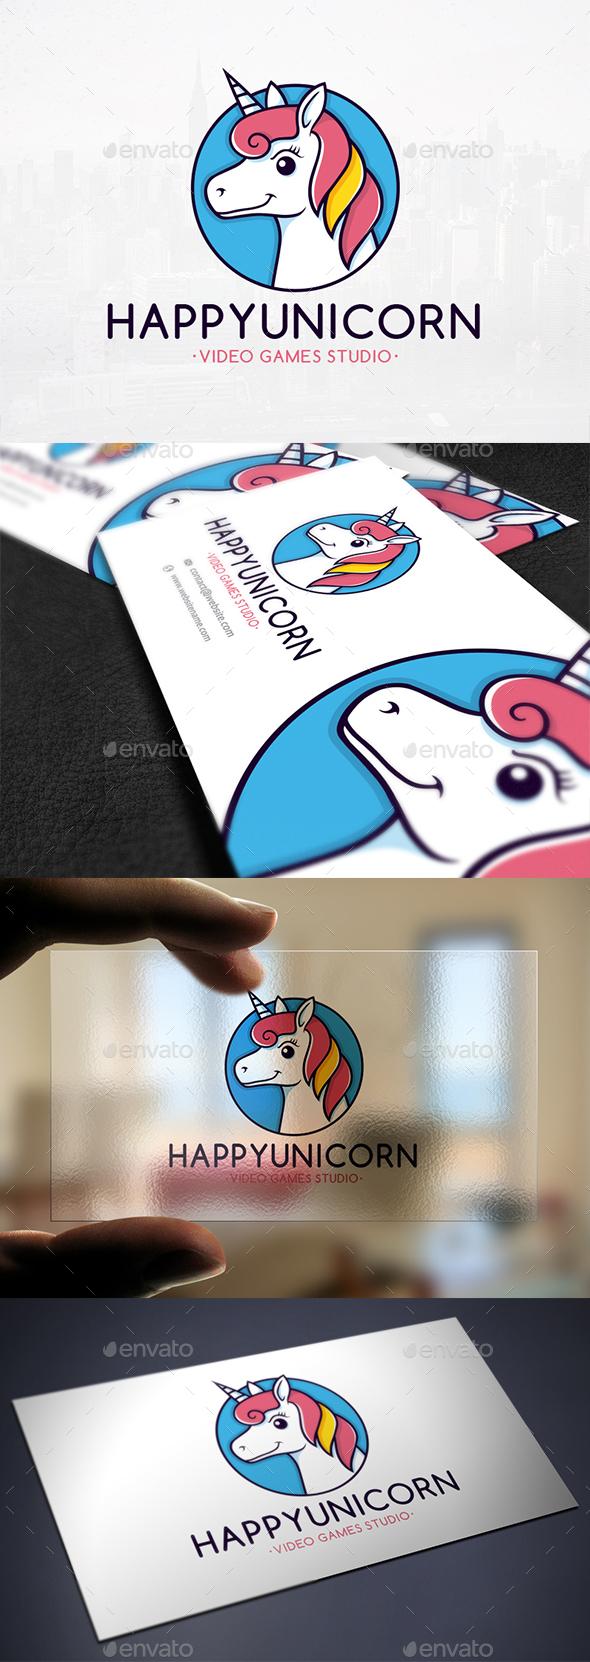 Colorful Unicorn Logo Template